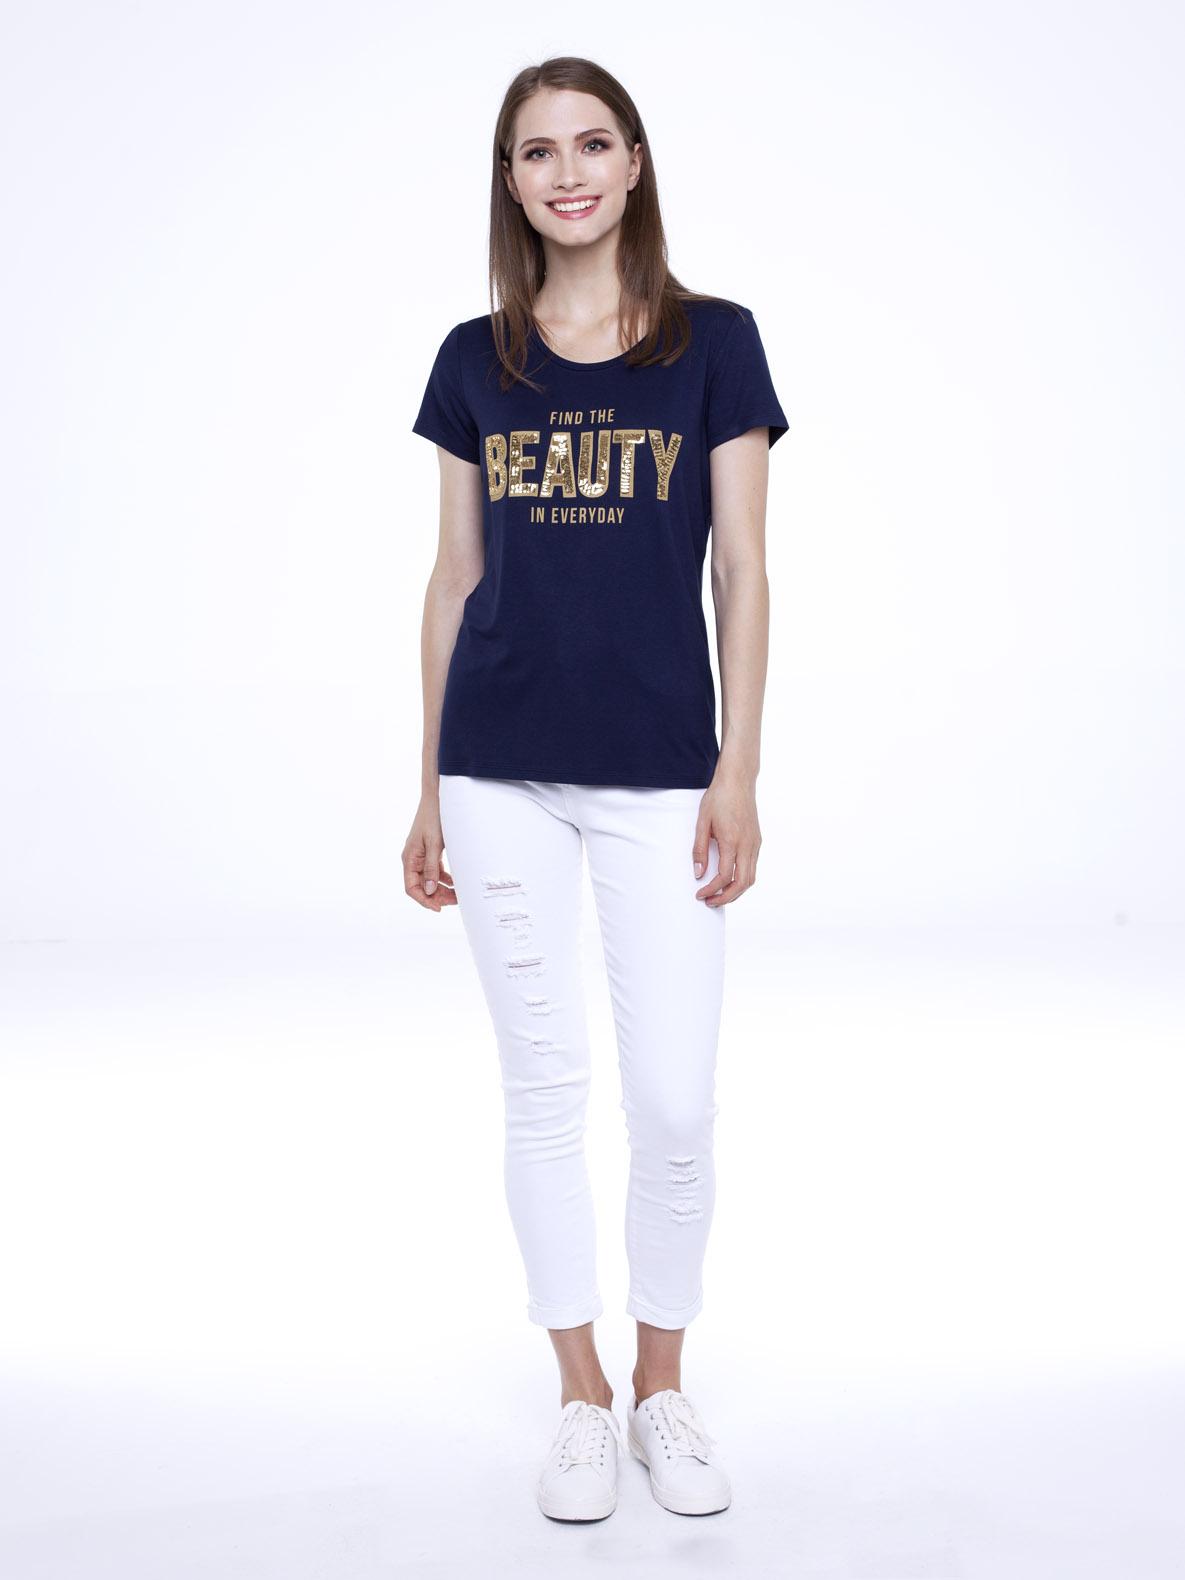 T-shirt She navy blue